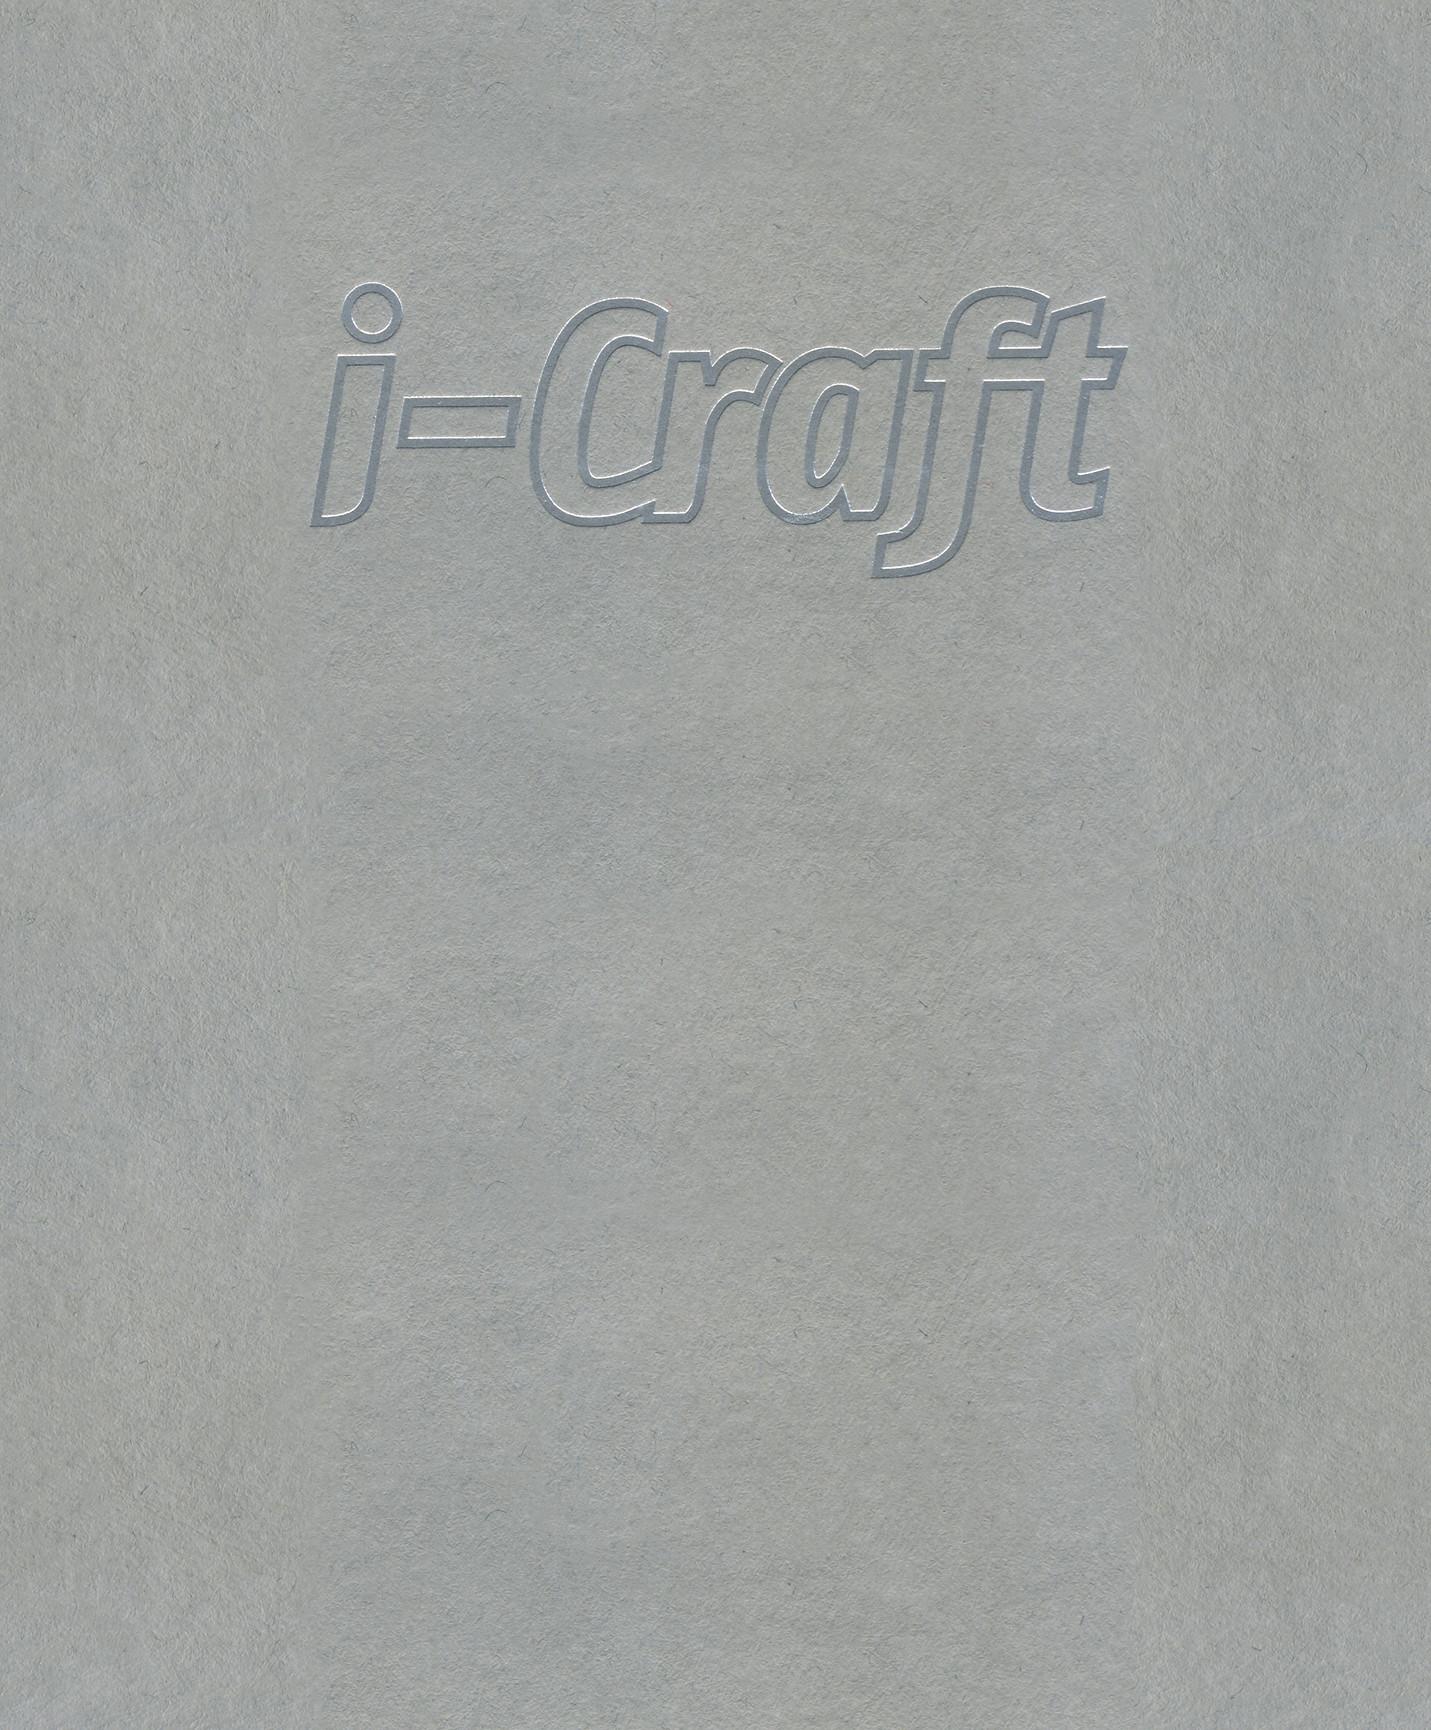 CV Icraft long02.jpg